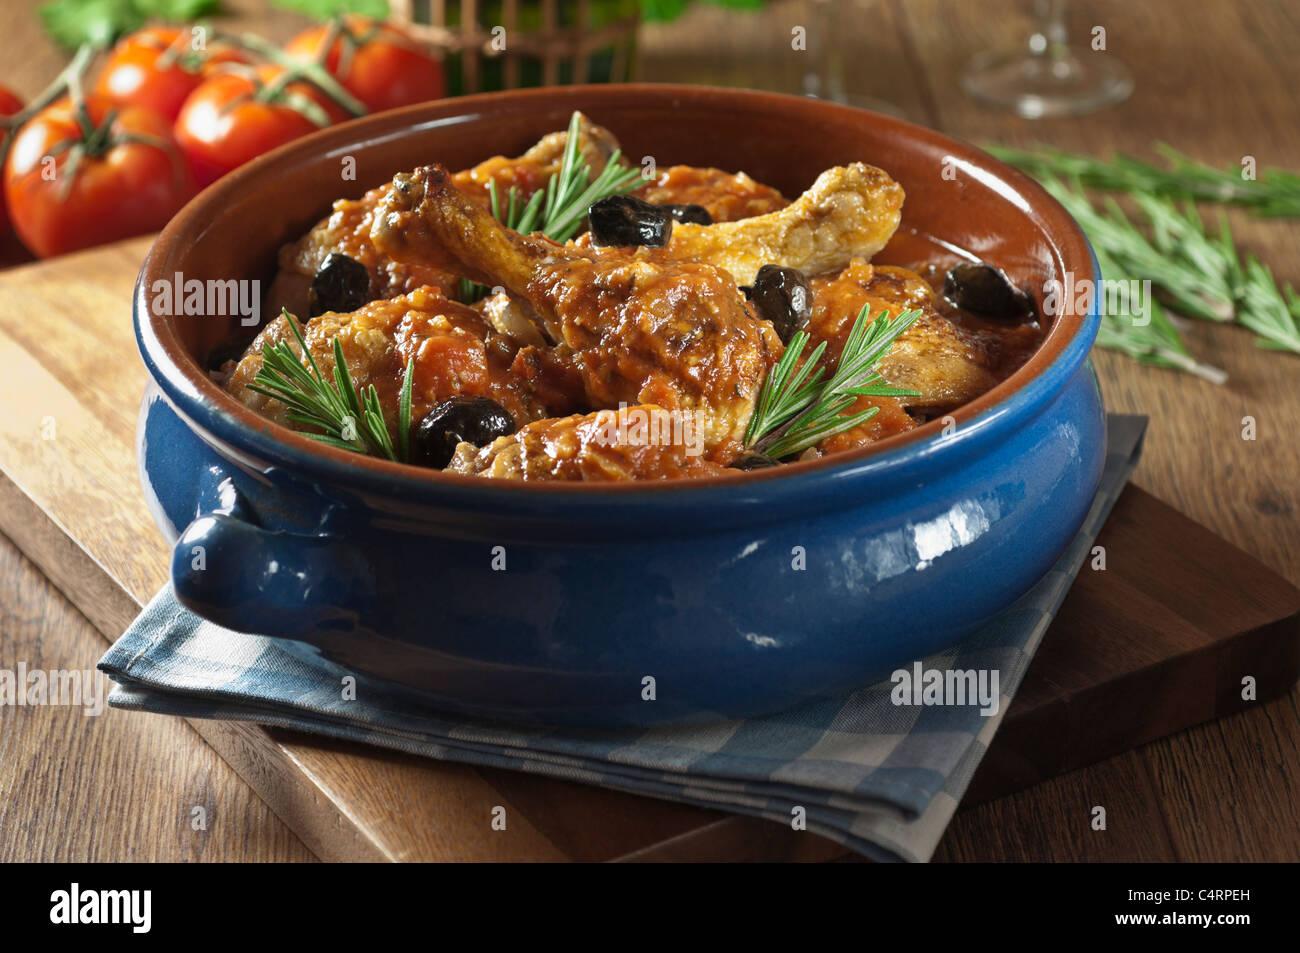 Pollo Cacciatore comida italiana Imagen De Stock